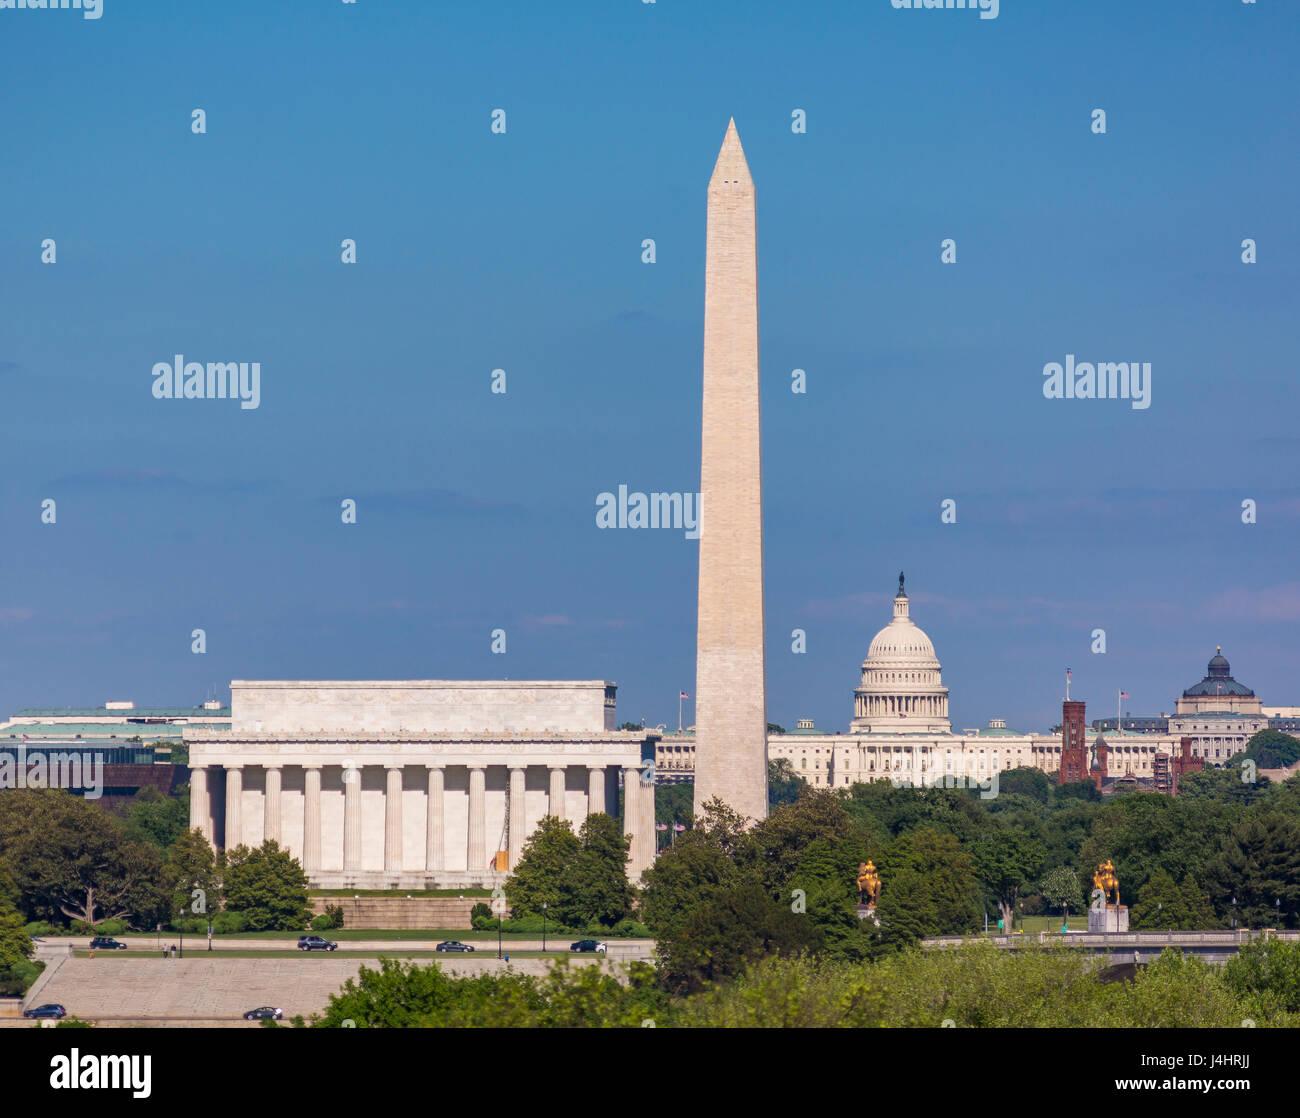 WASHINGTON, DC, USA - Skyline of Lincoln Memorial, Washington Monument, U.S. Capitol building and dome (L-R). - Stock Image